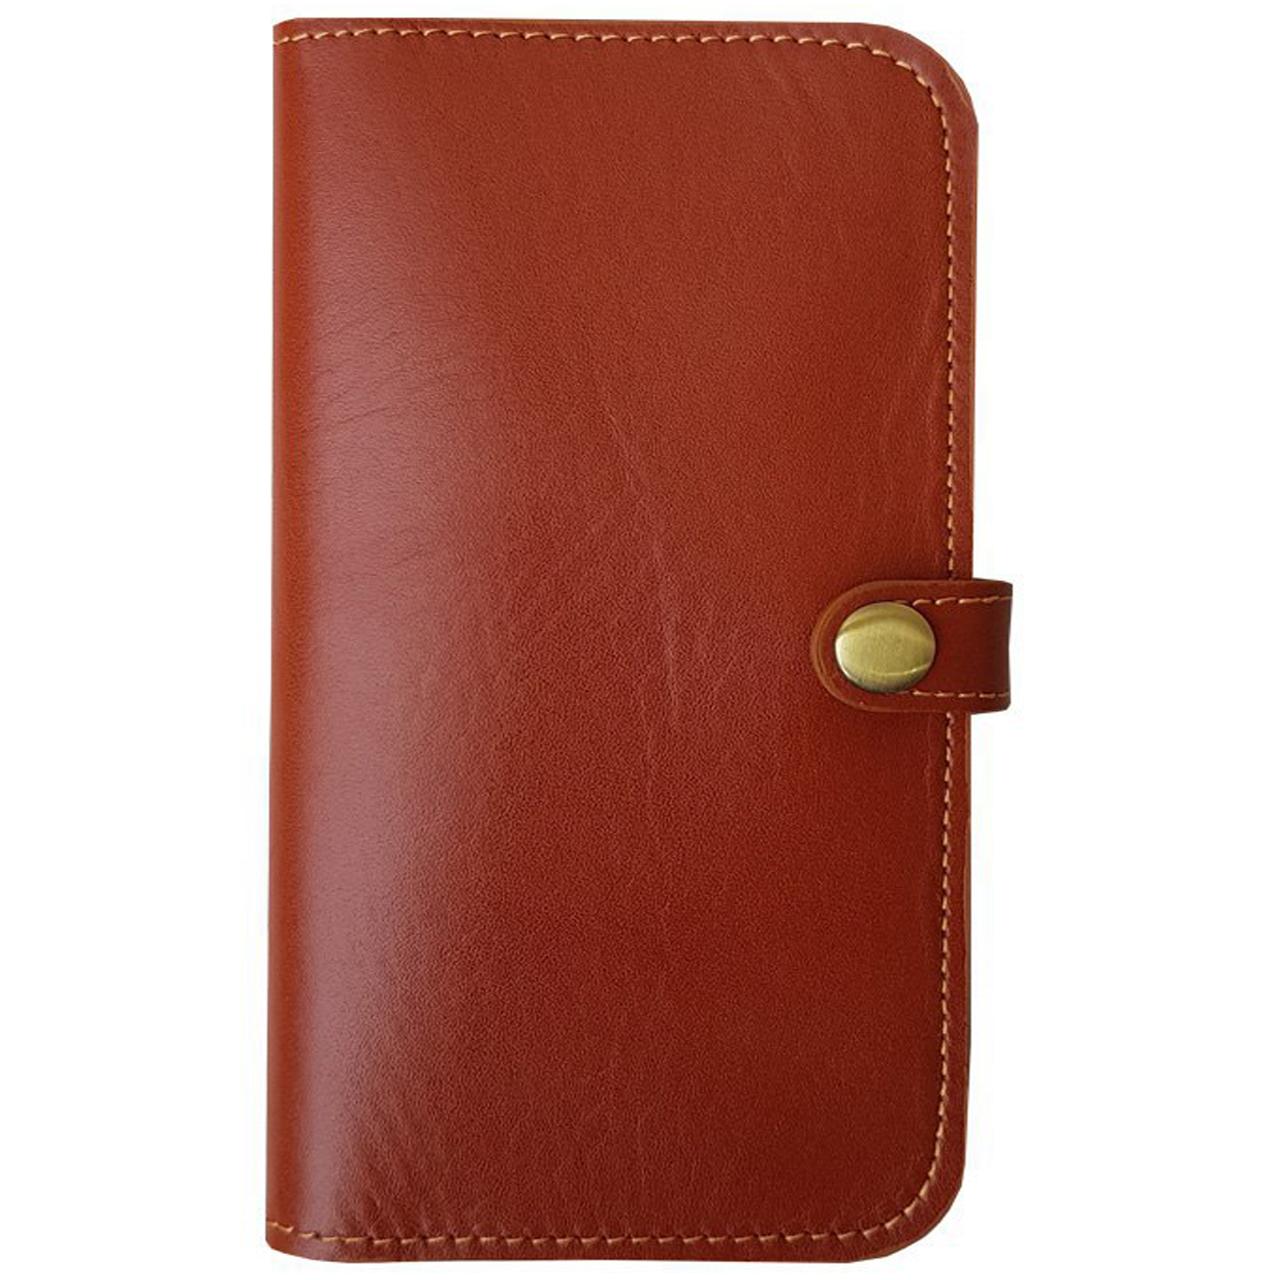 قیمت کیف پول و موبایل زانکو چرم مدل KM-221